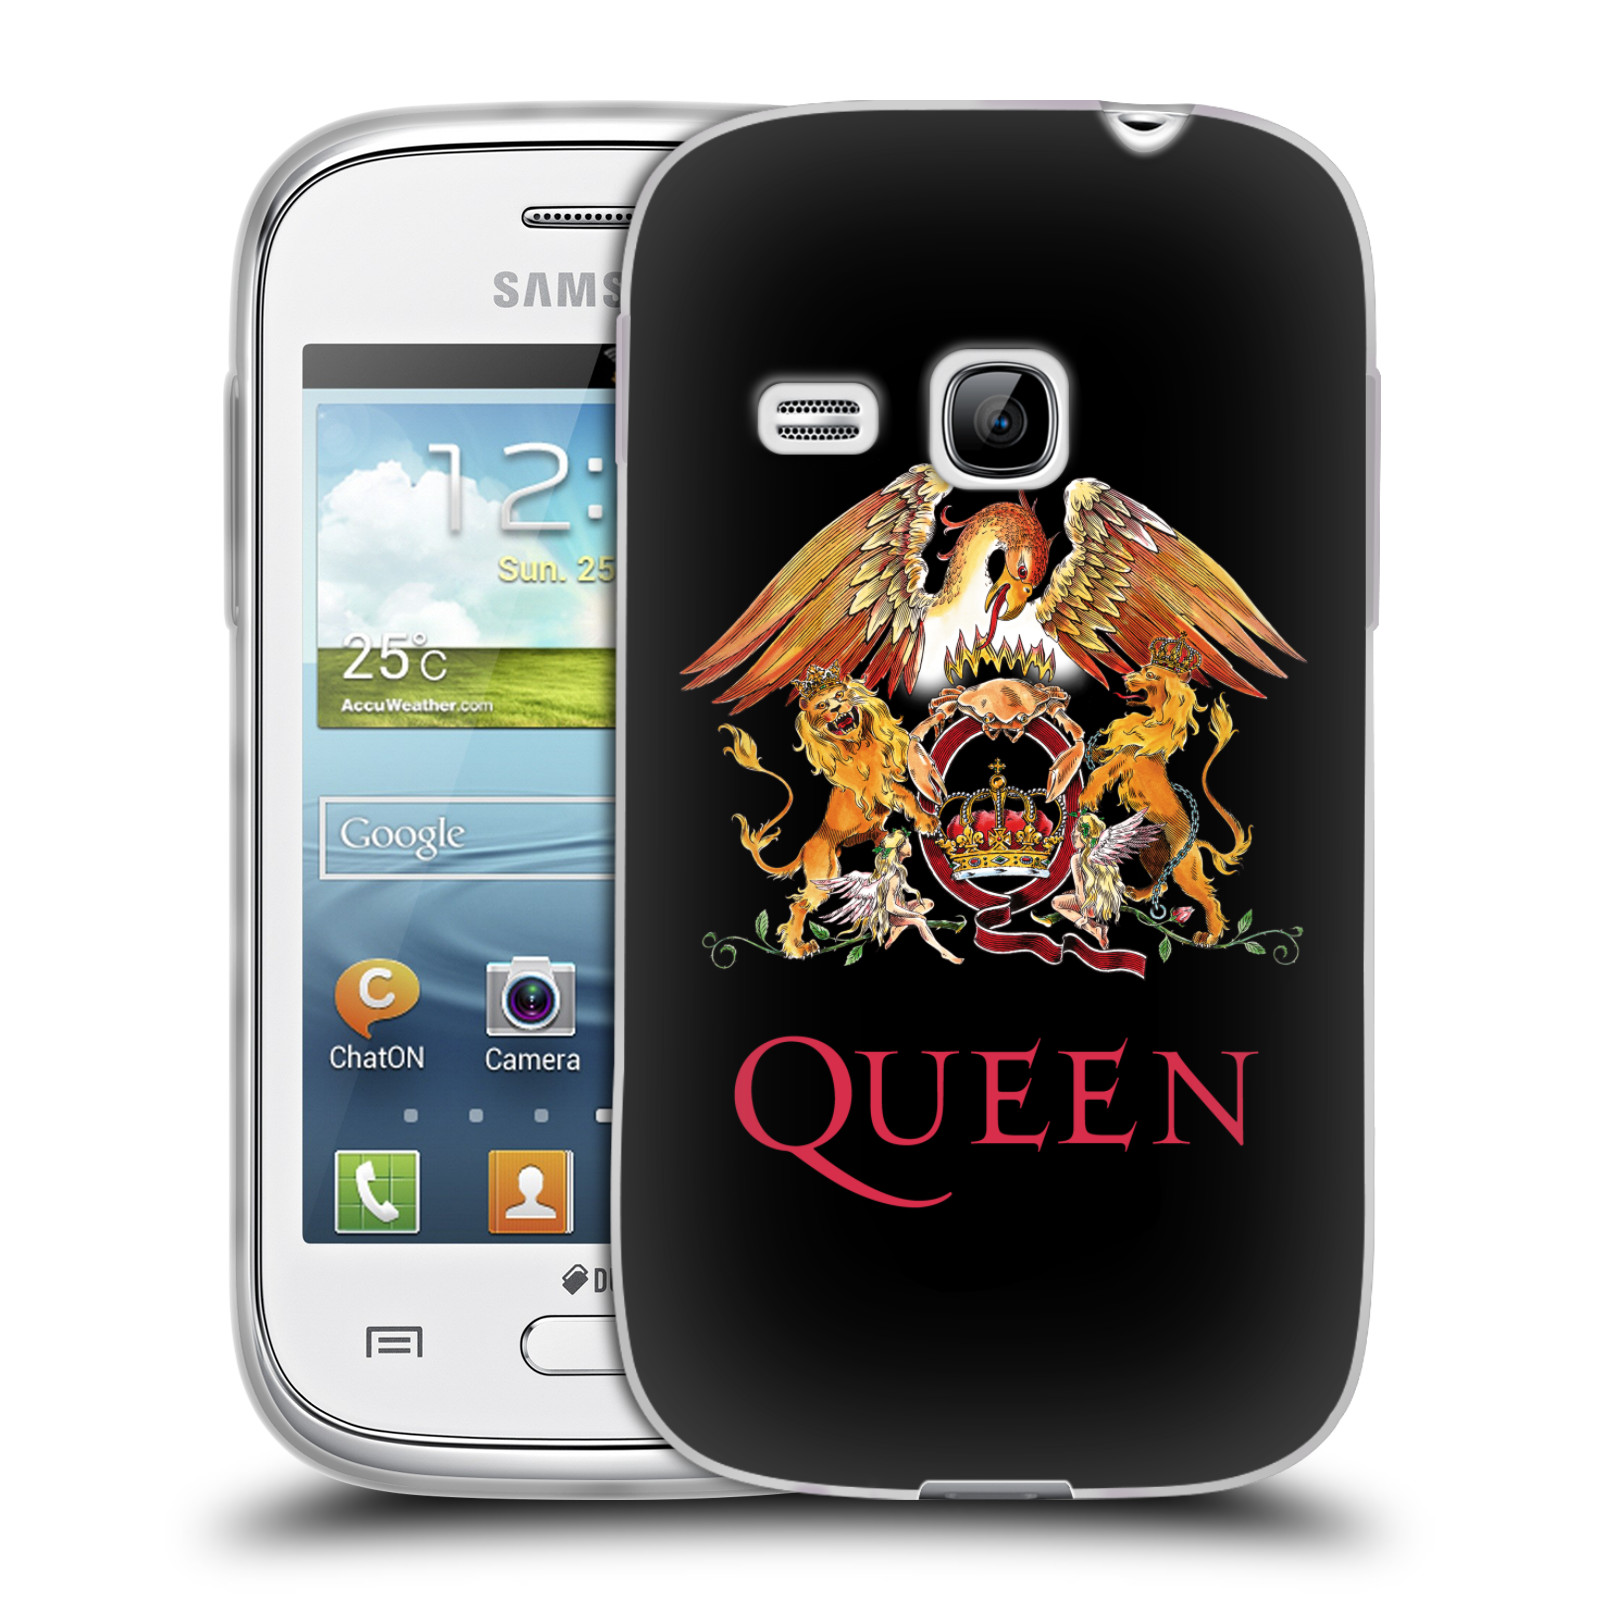 Silikonové pouzdro na mobil Samsung Galaxy Young HEAD CASE Queen - Logo (Silikonový kryt či obal na mobilní telefon licencovaným motivem Queen pro Samsung Galaxy Young GT-S6310)